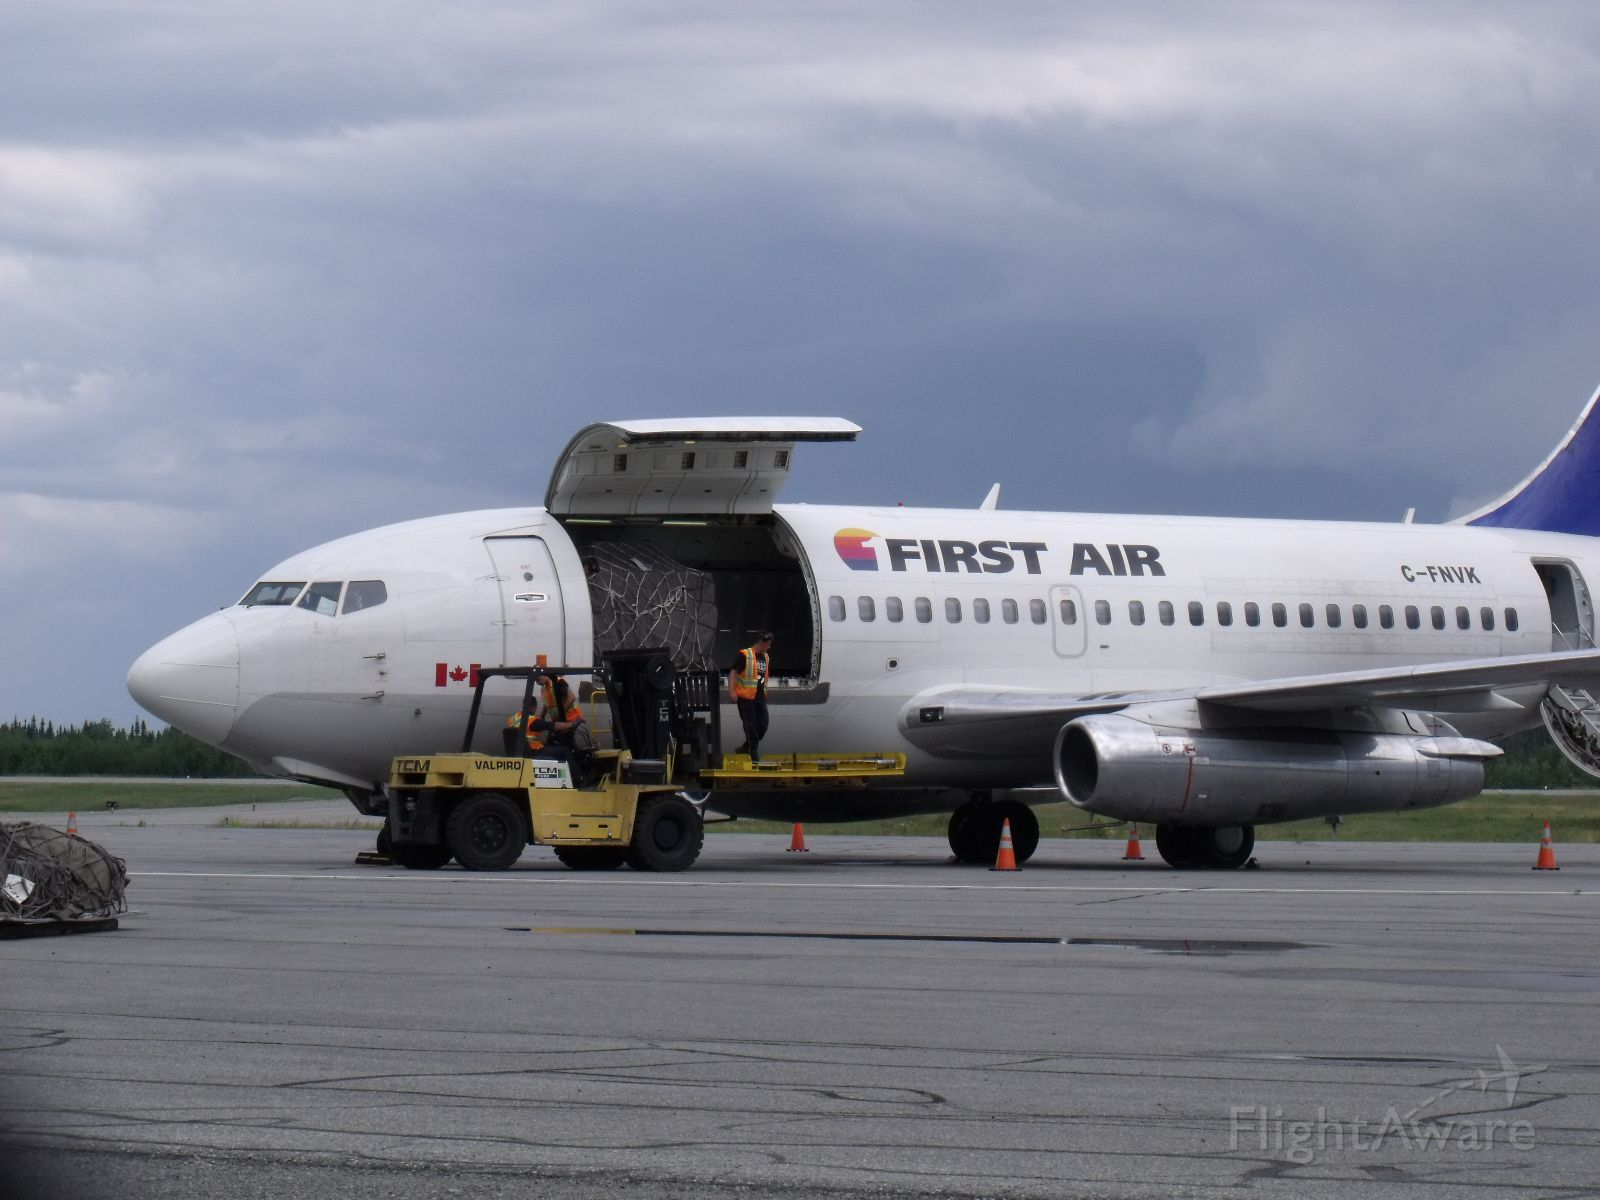 Boeing 737-200 (C-FNVK) - First Air Boeing 737-200 combi to Montréal-Trudeau (YUL)